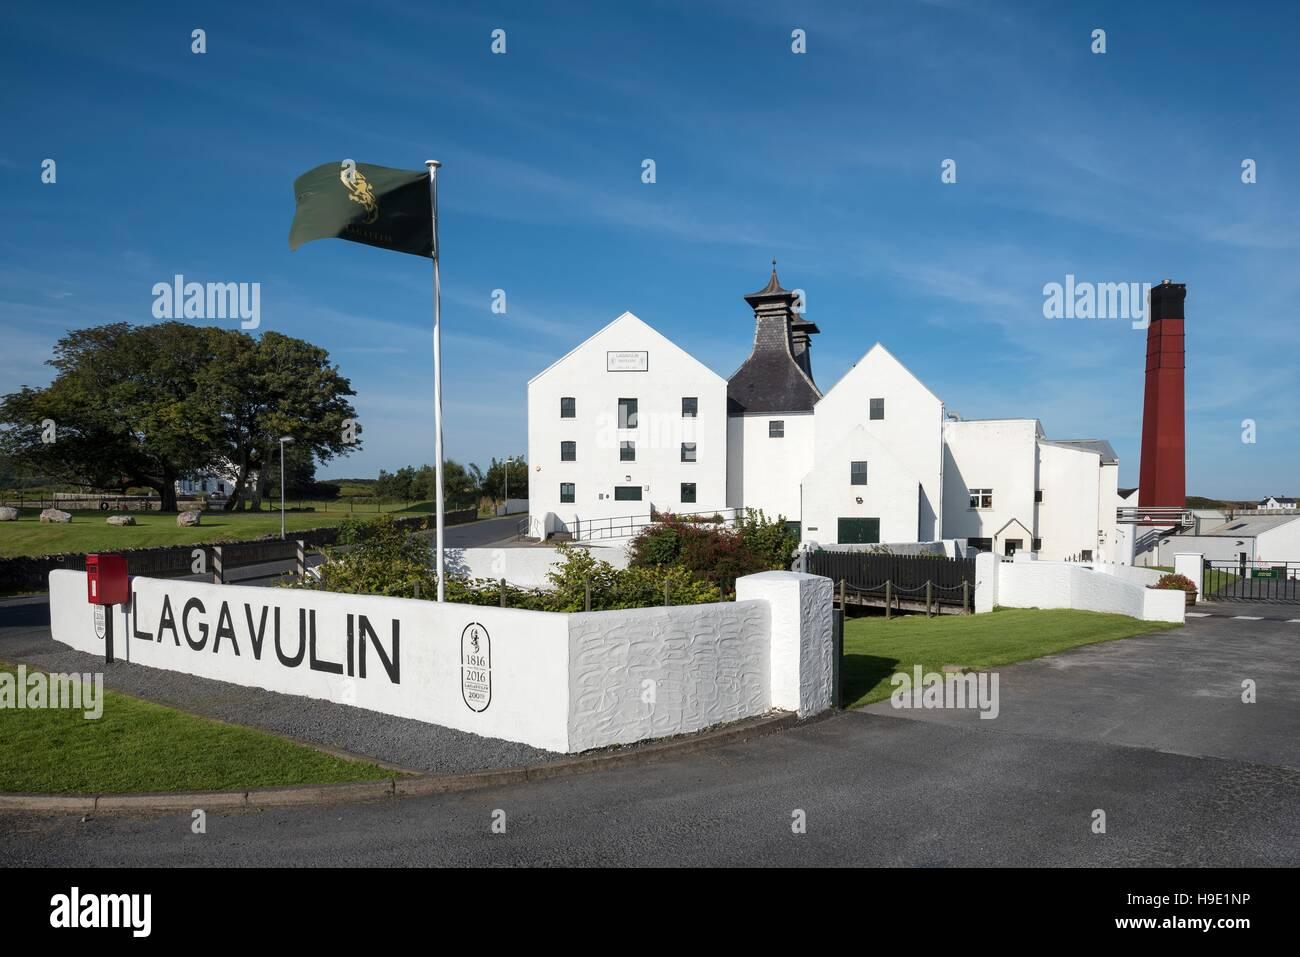 Lagavulin whiskey distillery, Islay, Inner Hebrides, Scotland, United Kingdom Stock Photo